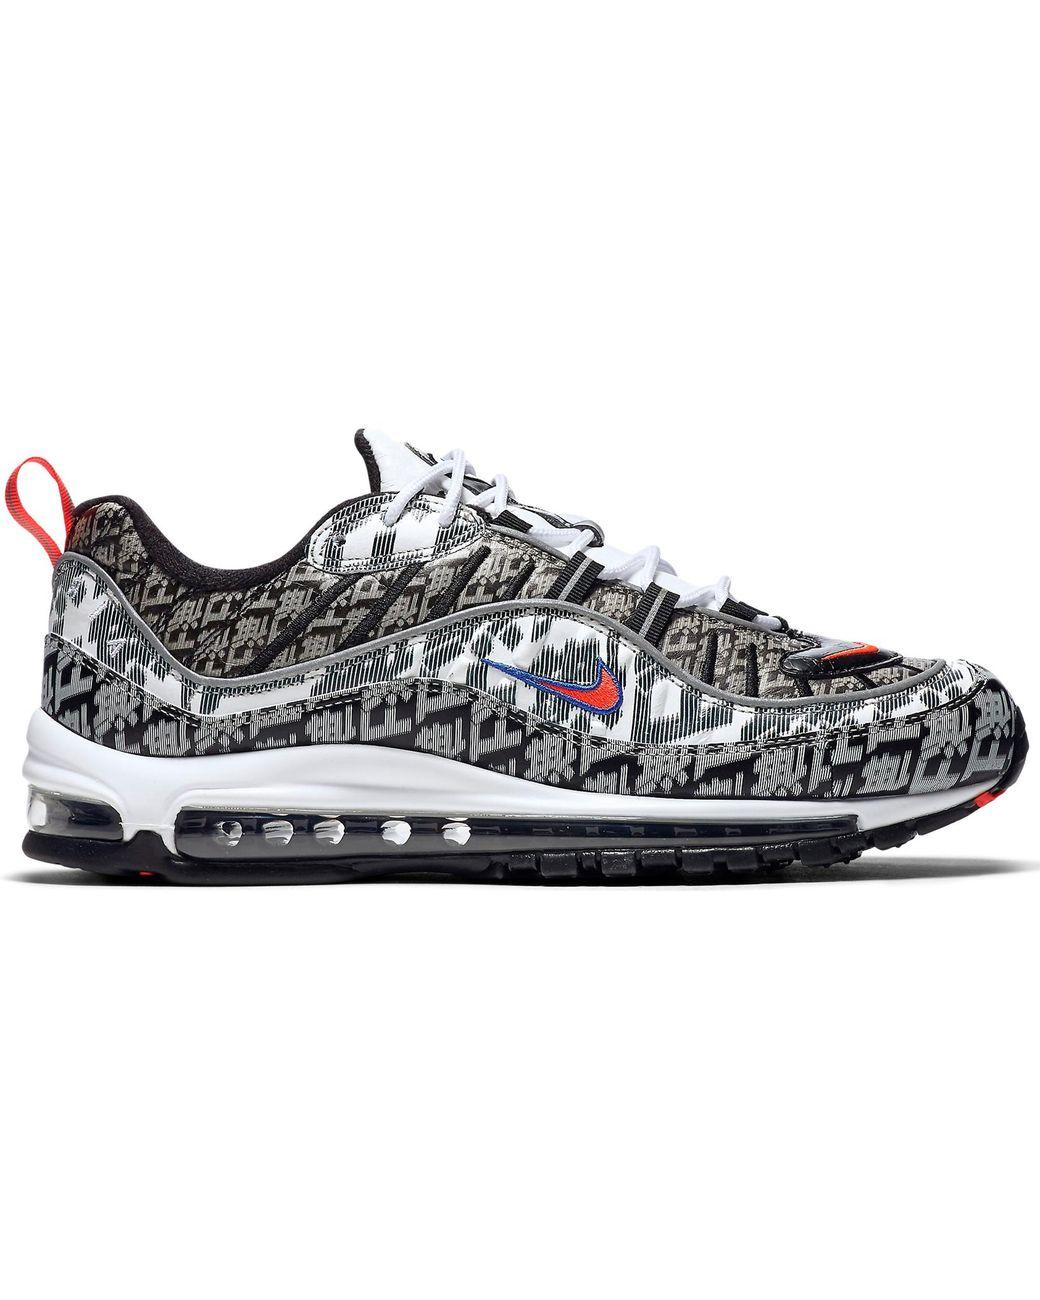 Nike Air Max 98 Shanghai Marathon (2018) (BlackWhite